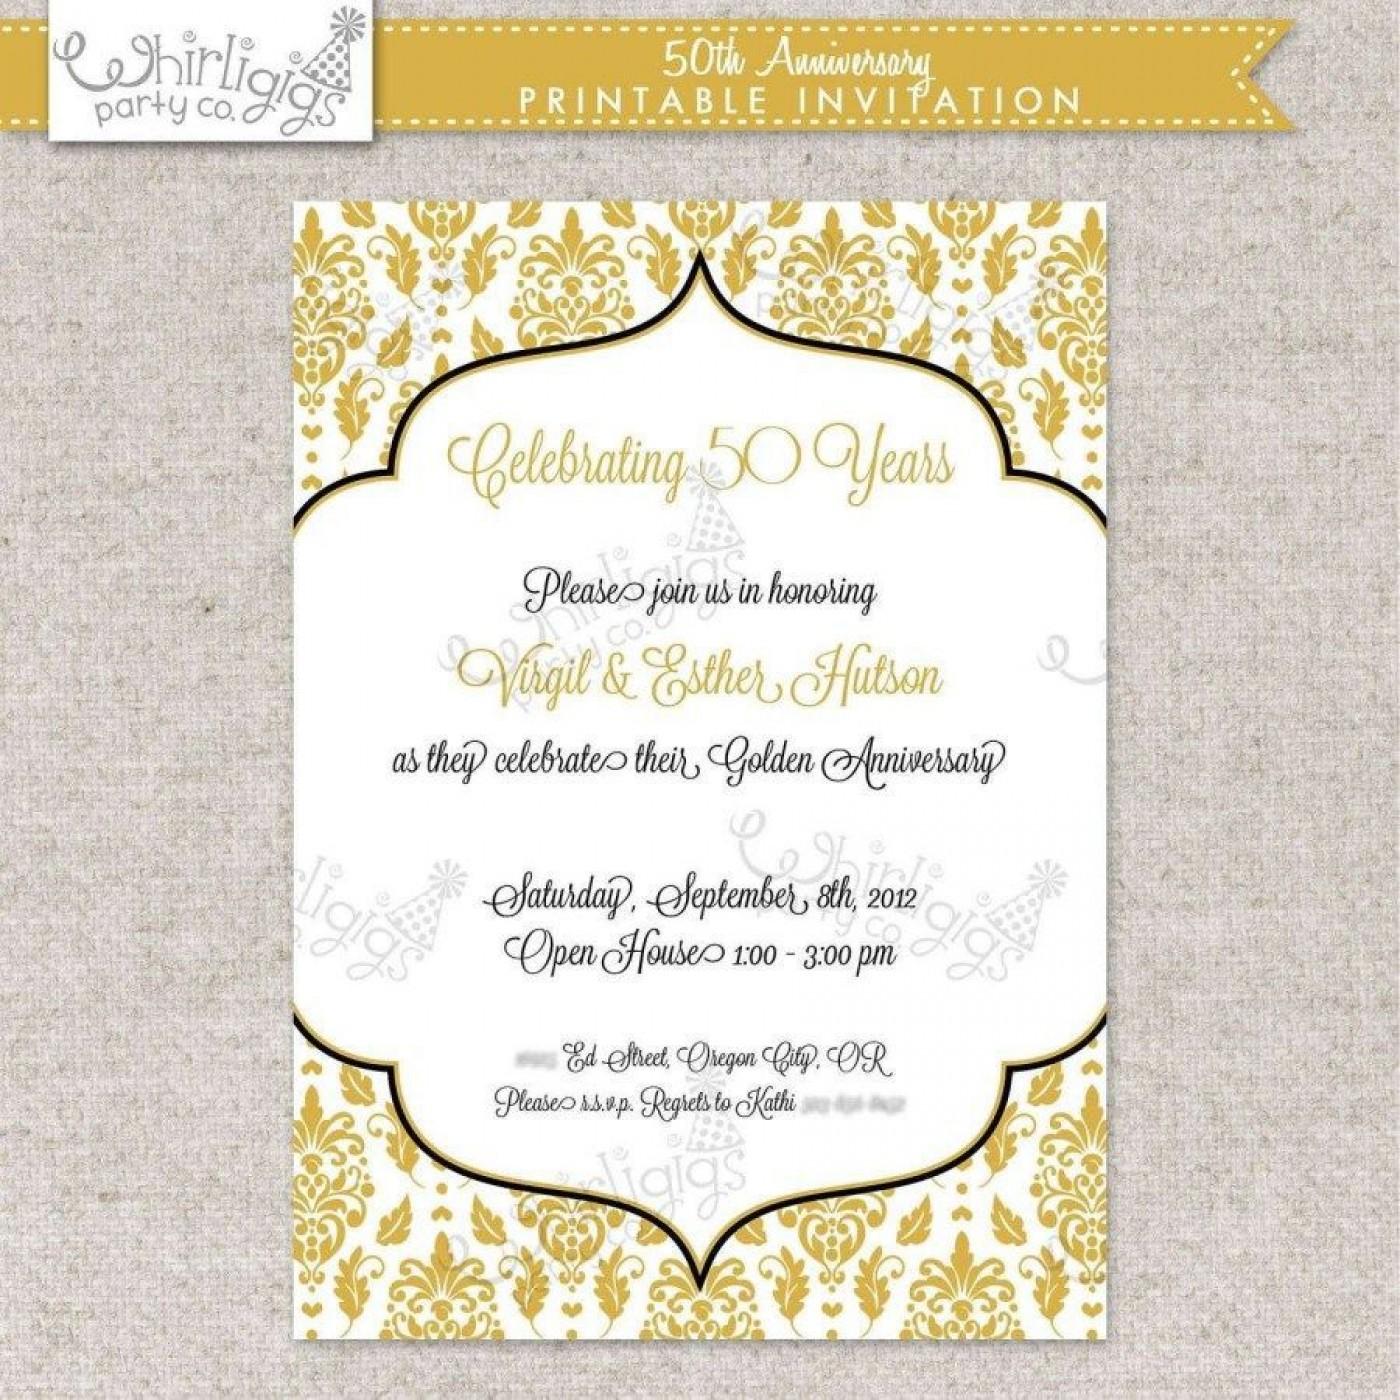 002 Fearsome Free Printable 50th Wedding Anniversary Invitation Template Concept 1400